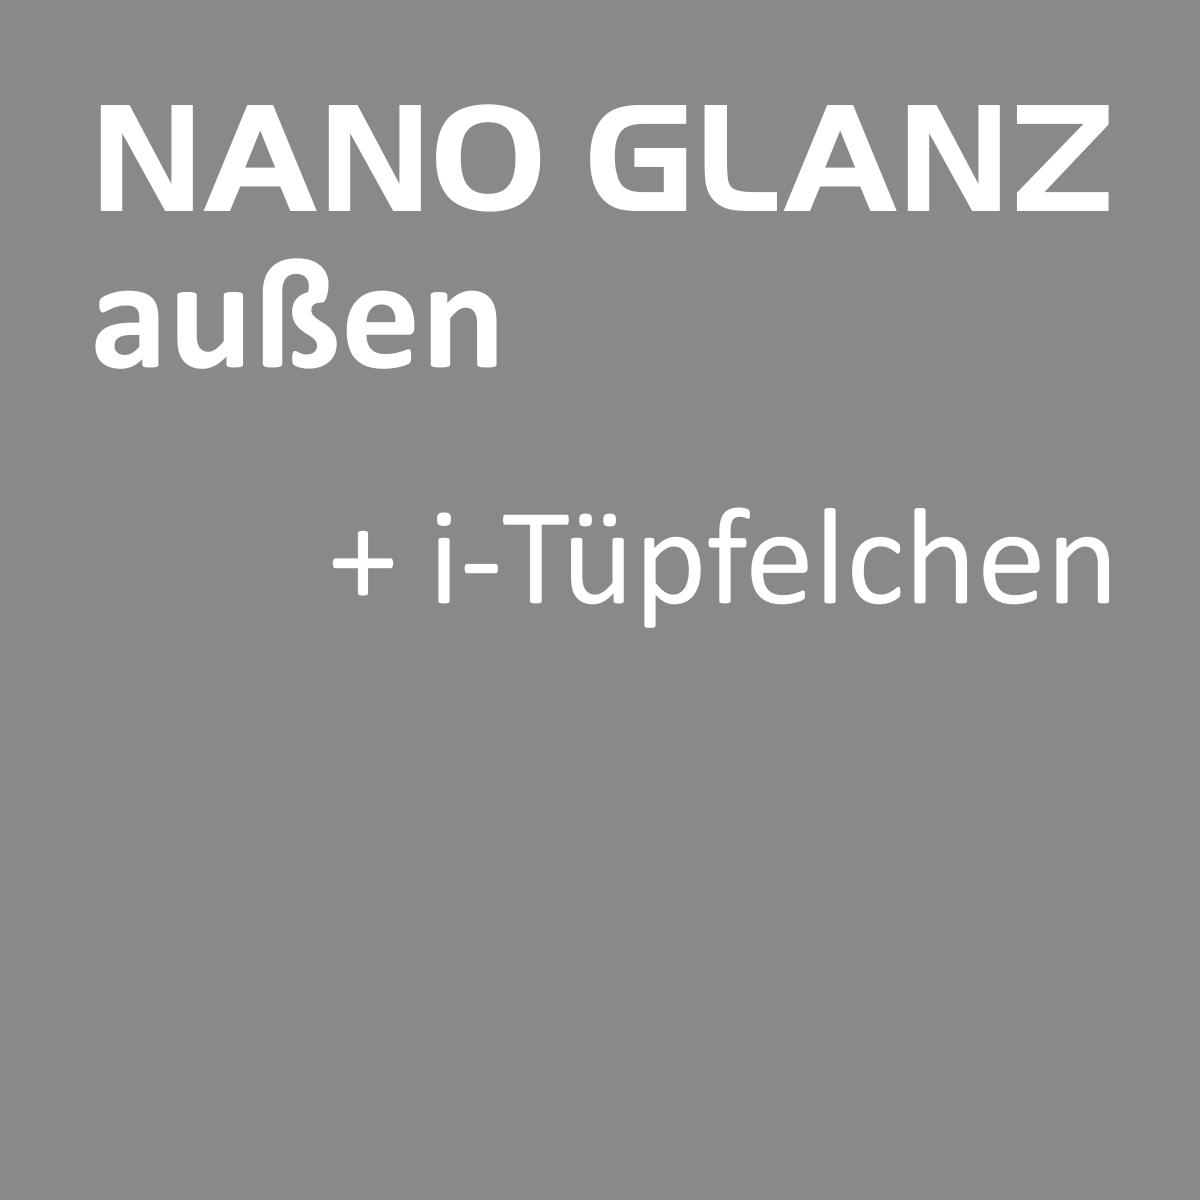 Nano Glanz_2 Text